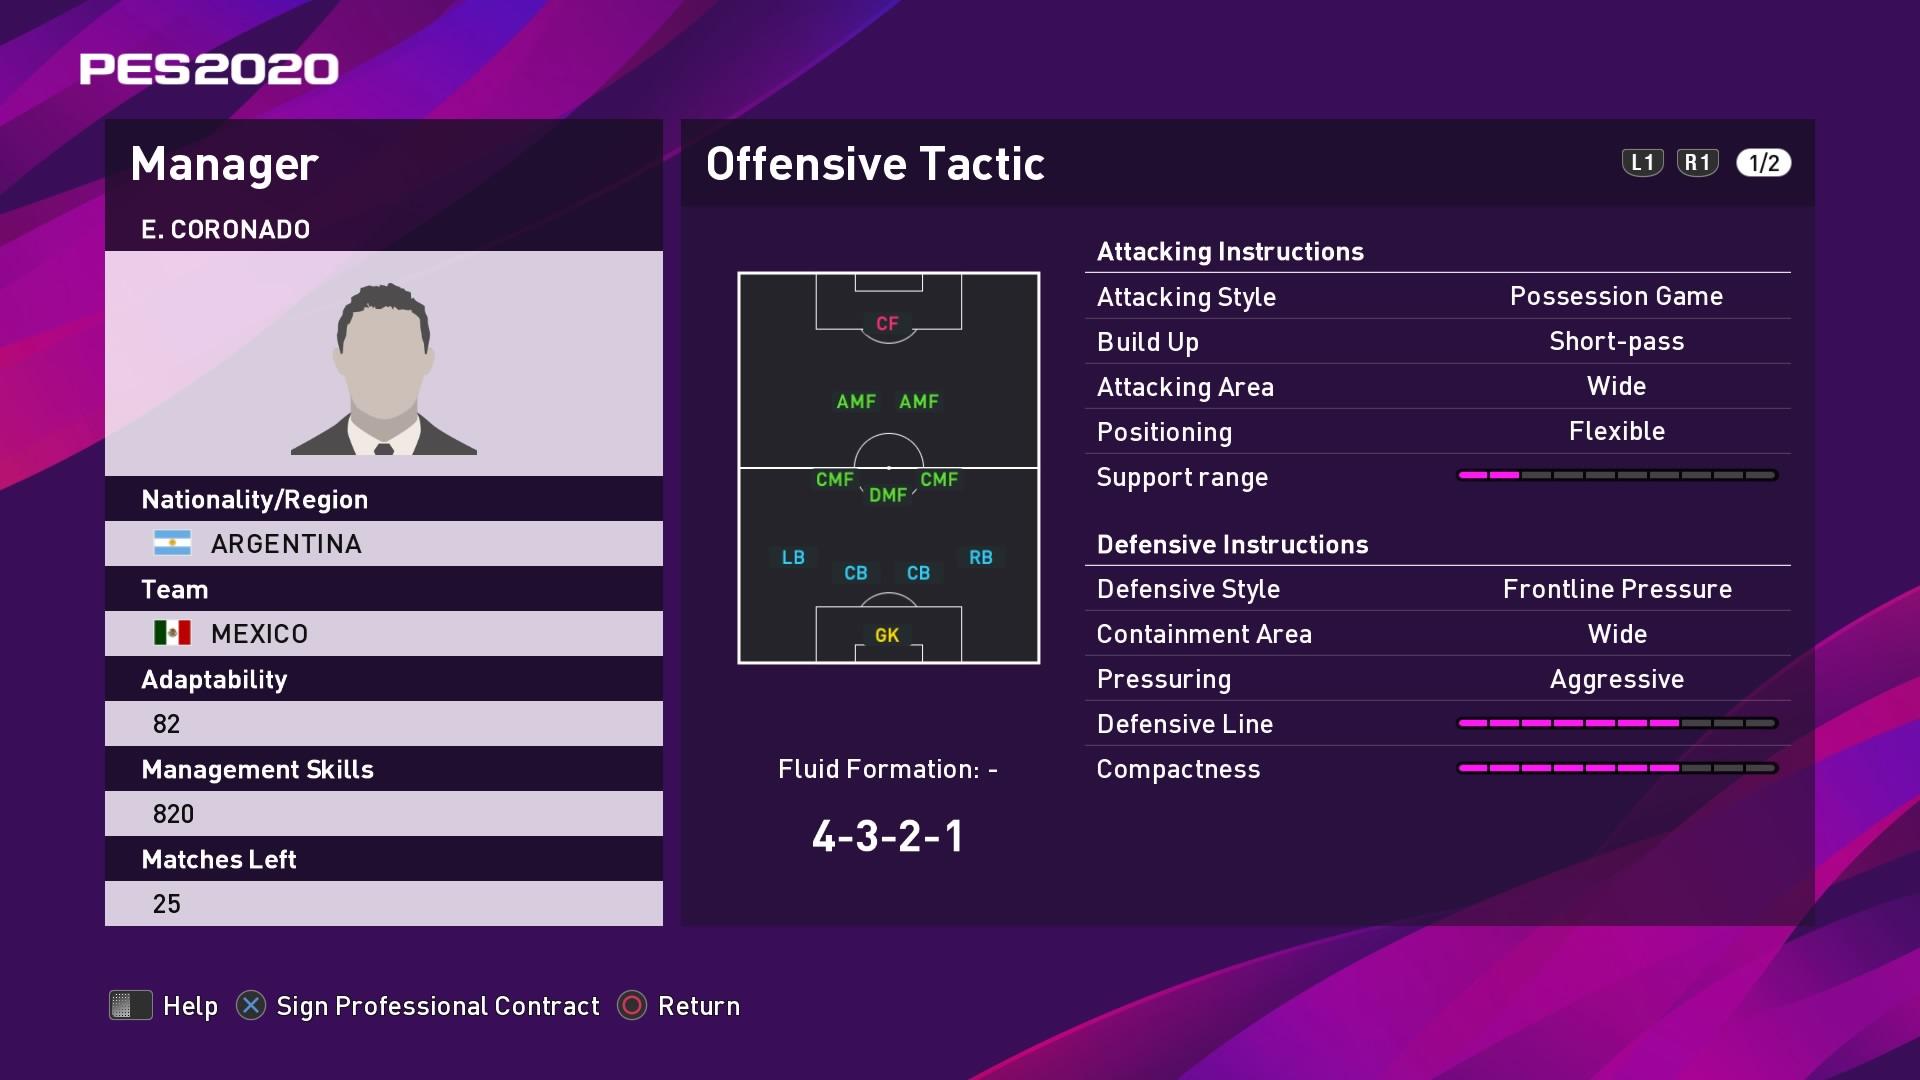 "E. Coronado (2) (Gerardo ""Tata"" Martino) Offensive Tactic in PES 2020 myClub"